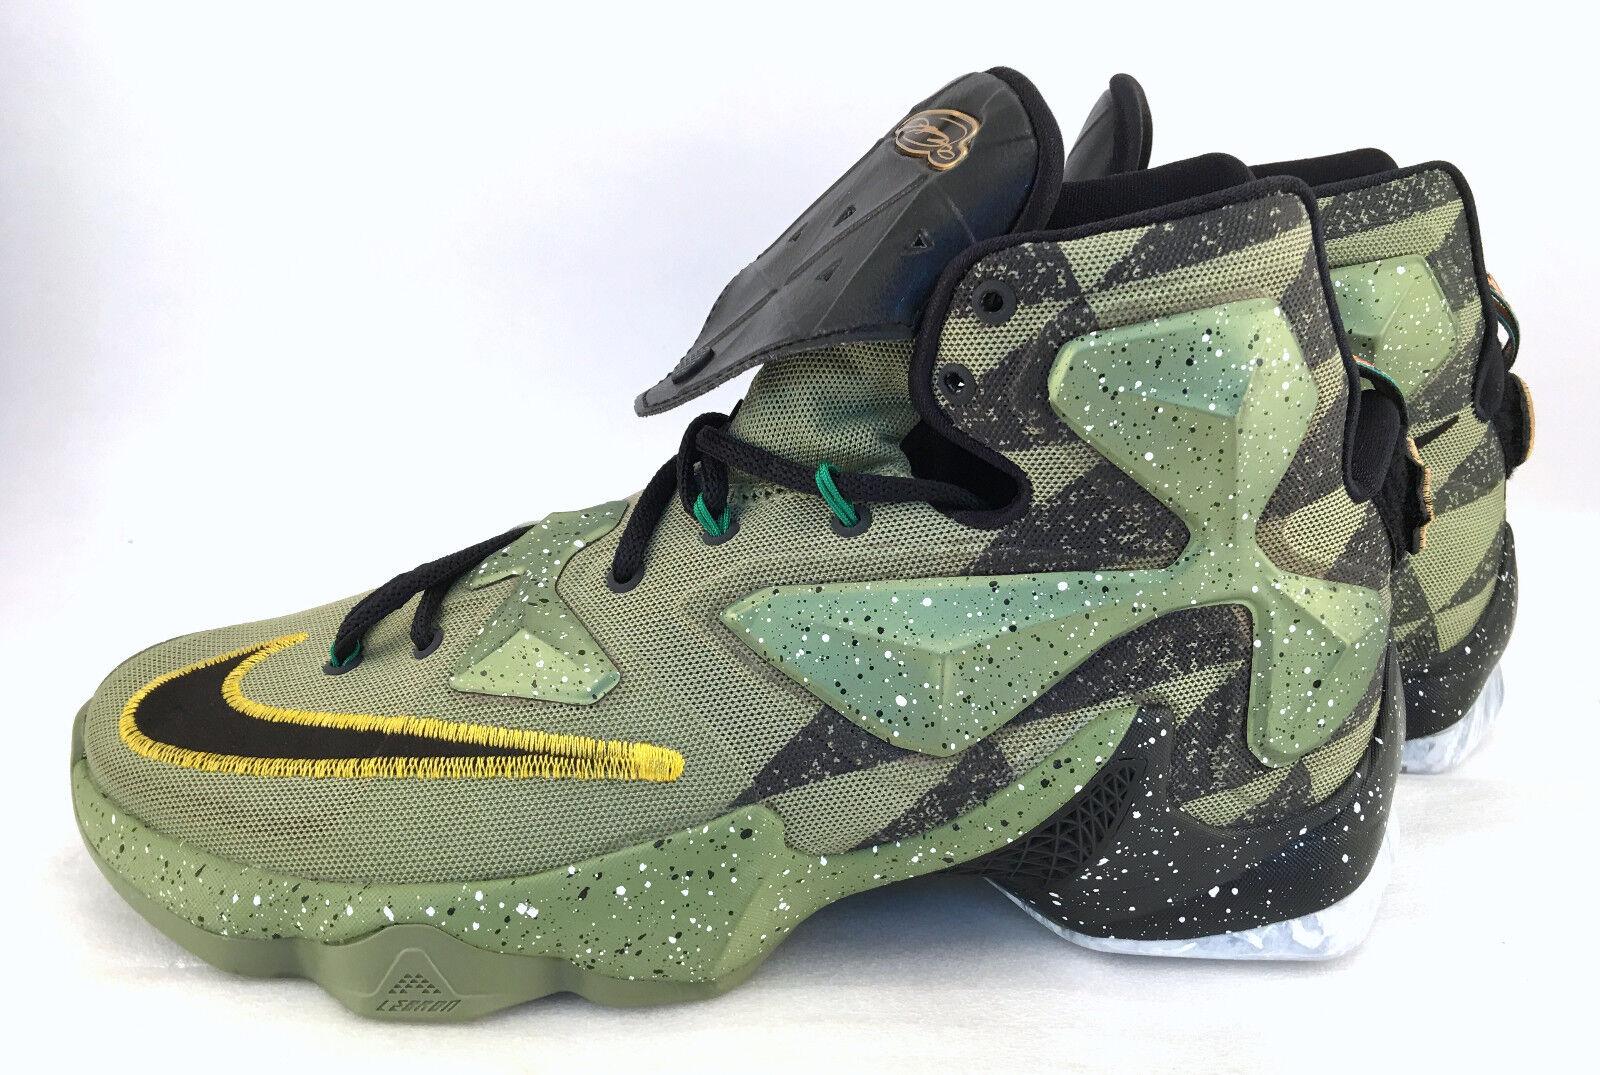 Nike LeBron XIII 13 como All Star Game cocodrilo Negro 835659 835659 Negro 309 Elite DS SZ 10,5 estacional de liquidación 50d8a7